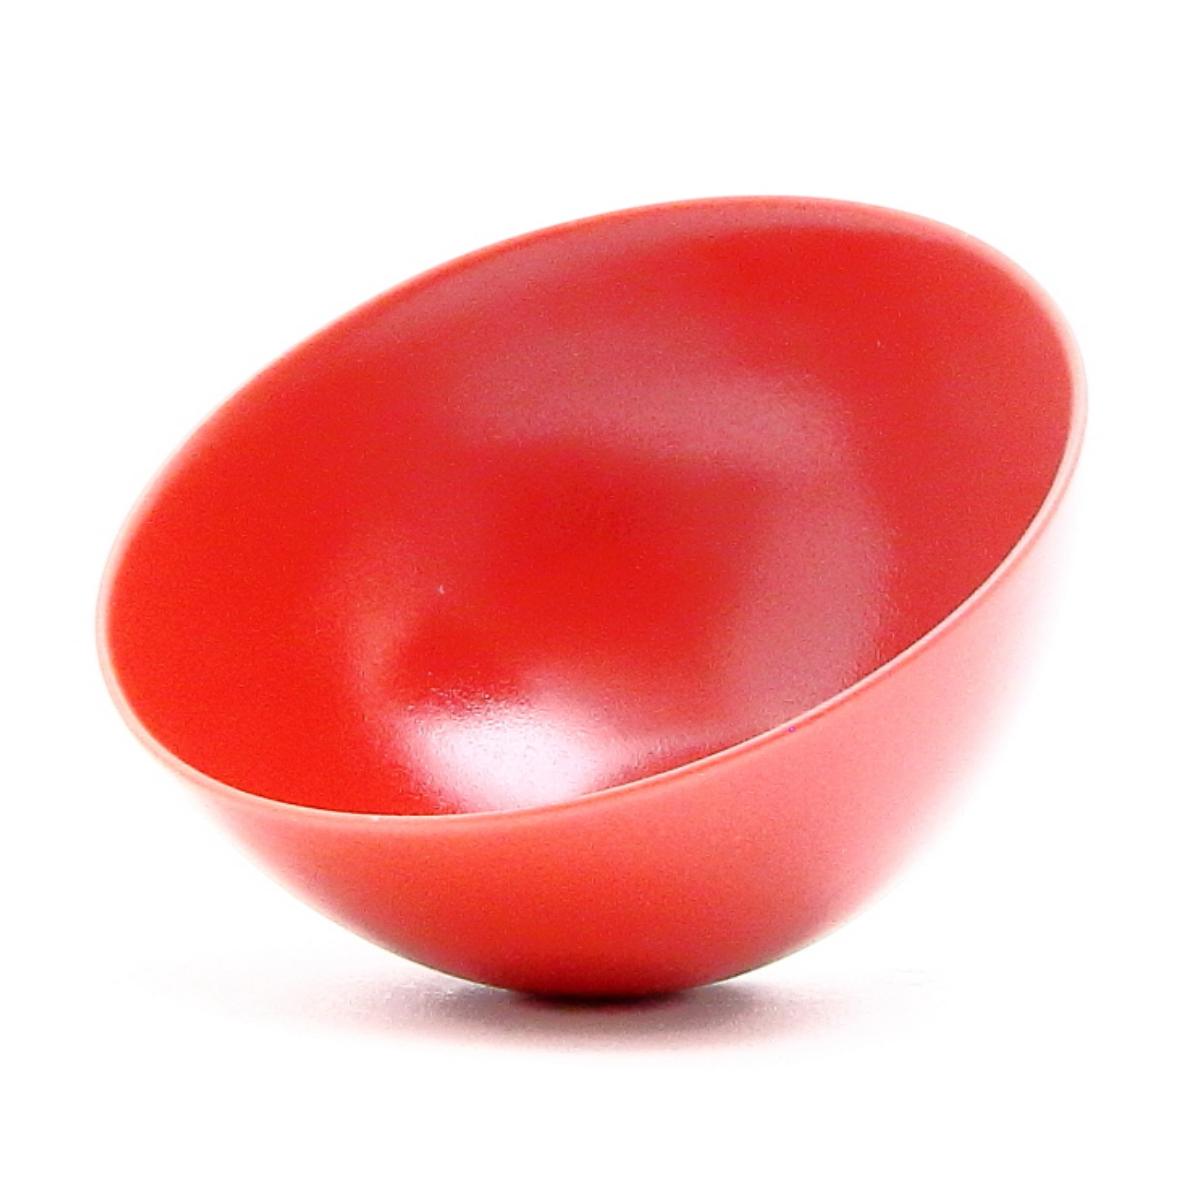 Bowl S ローズレッド 詳細画像3